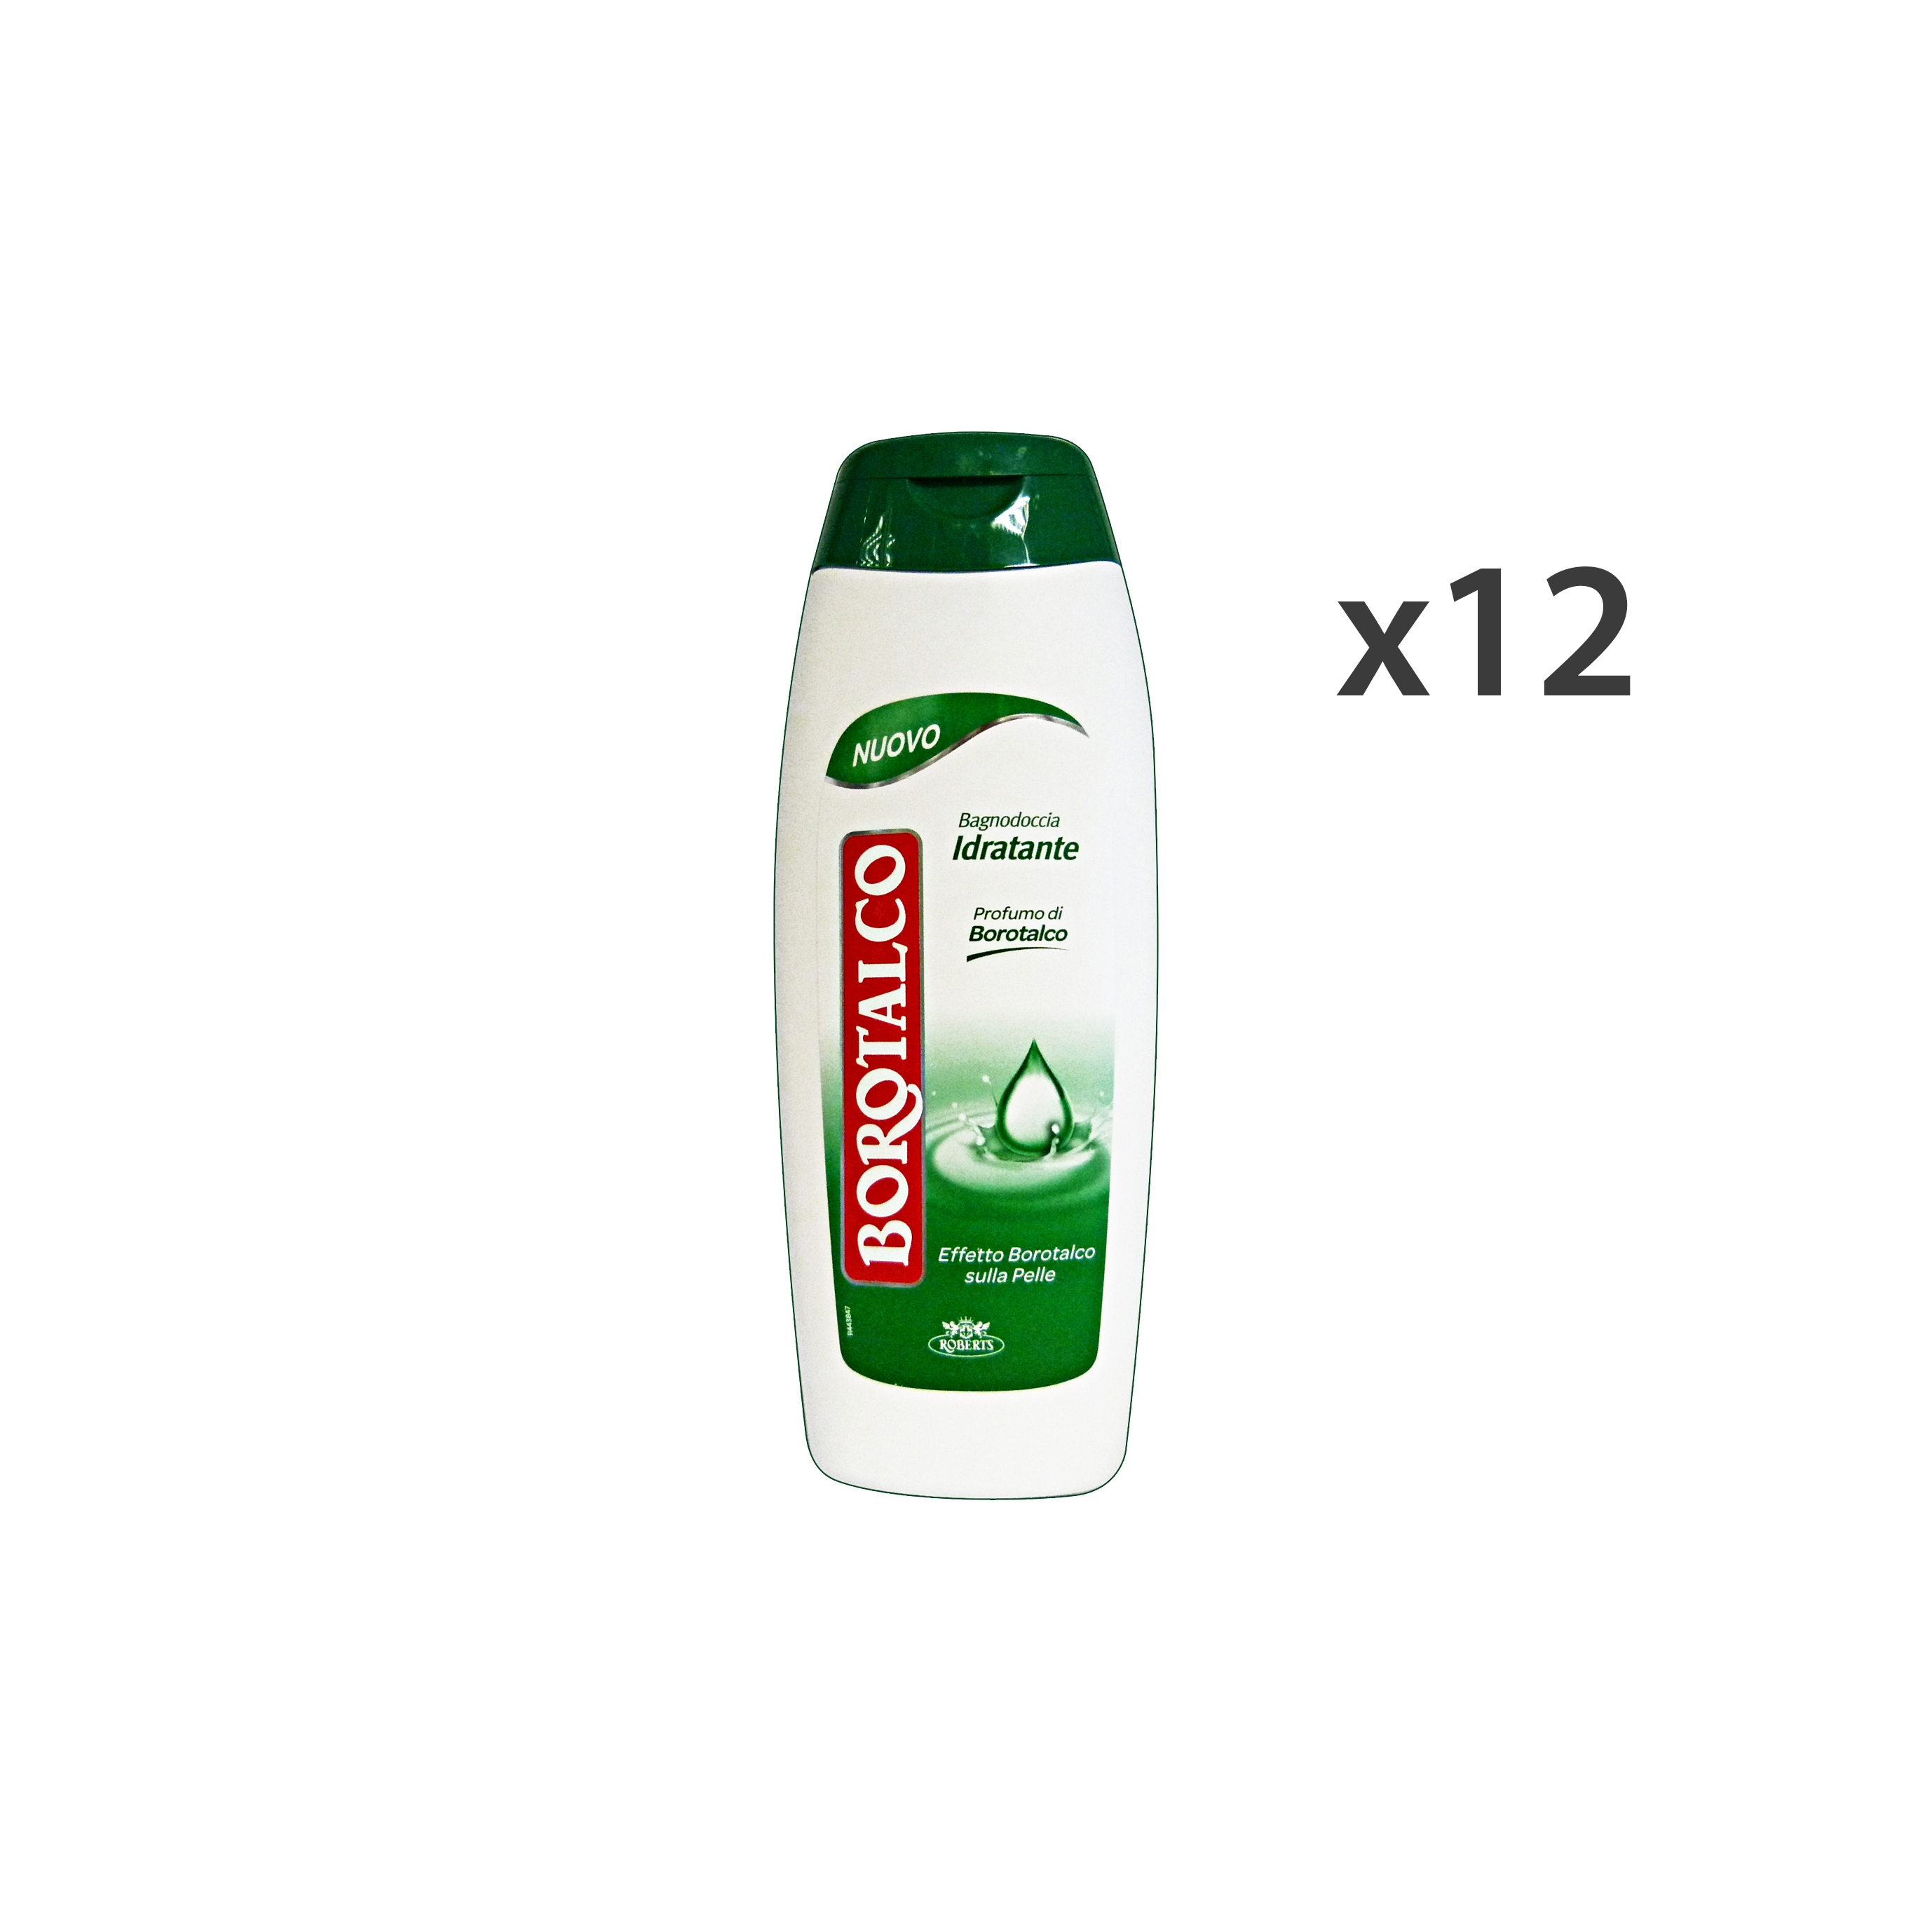 Acquista Set 12 Bagno Idratante 500 Ml 17534362   Glooke.com